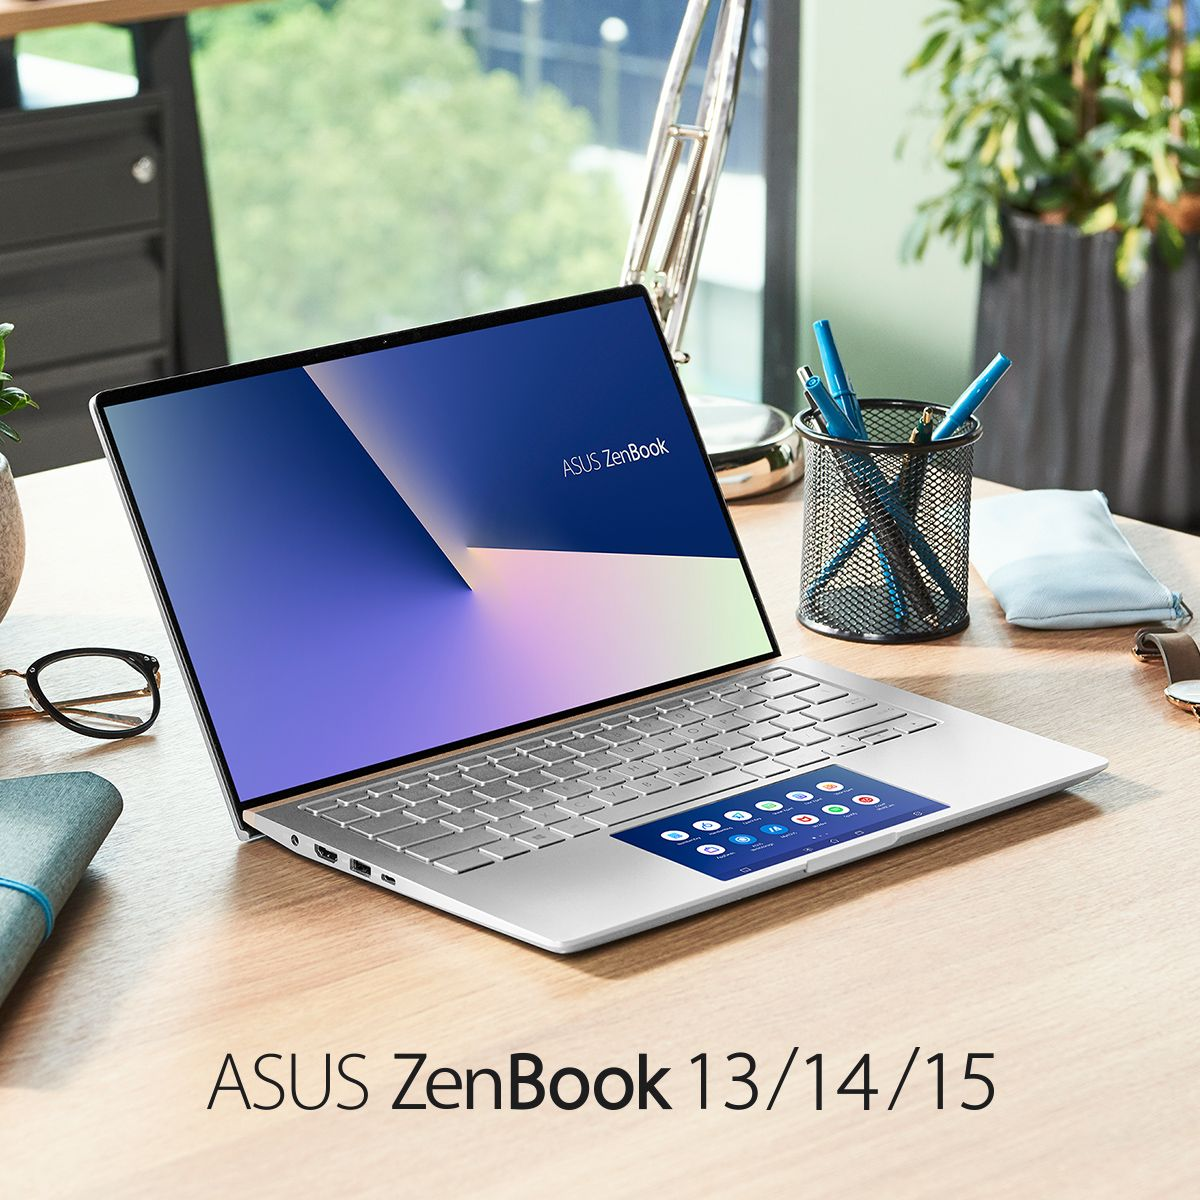 Asus Zenbook 13 14 15 Creativity Style Innovation Asus Ultrabook Interactive Display